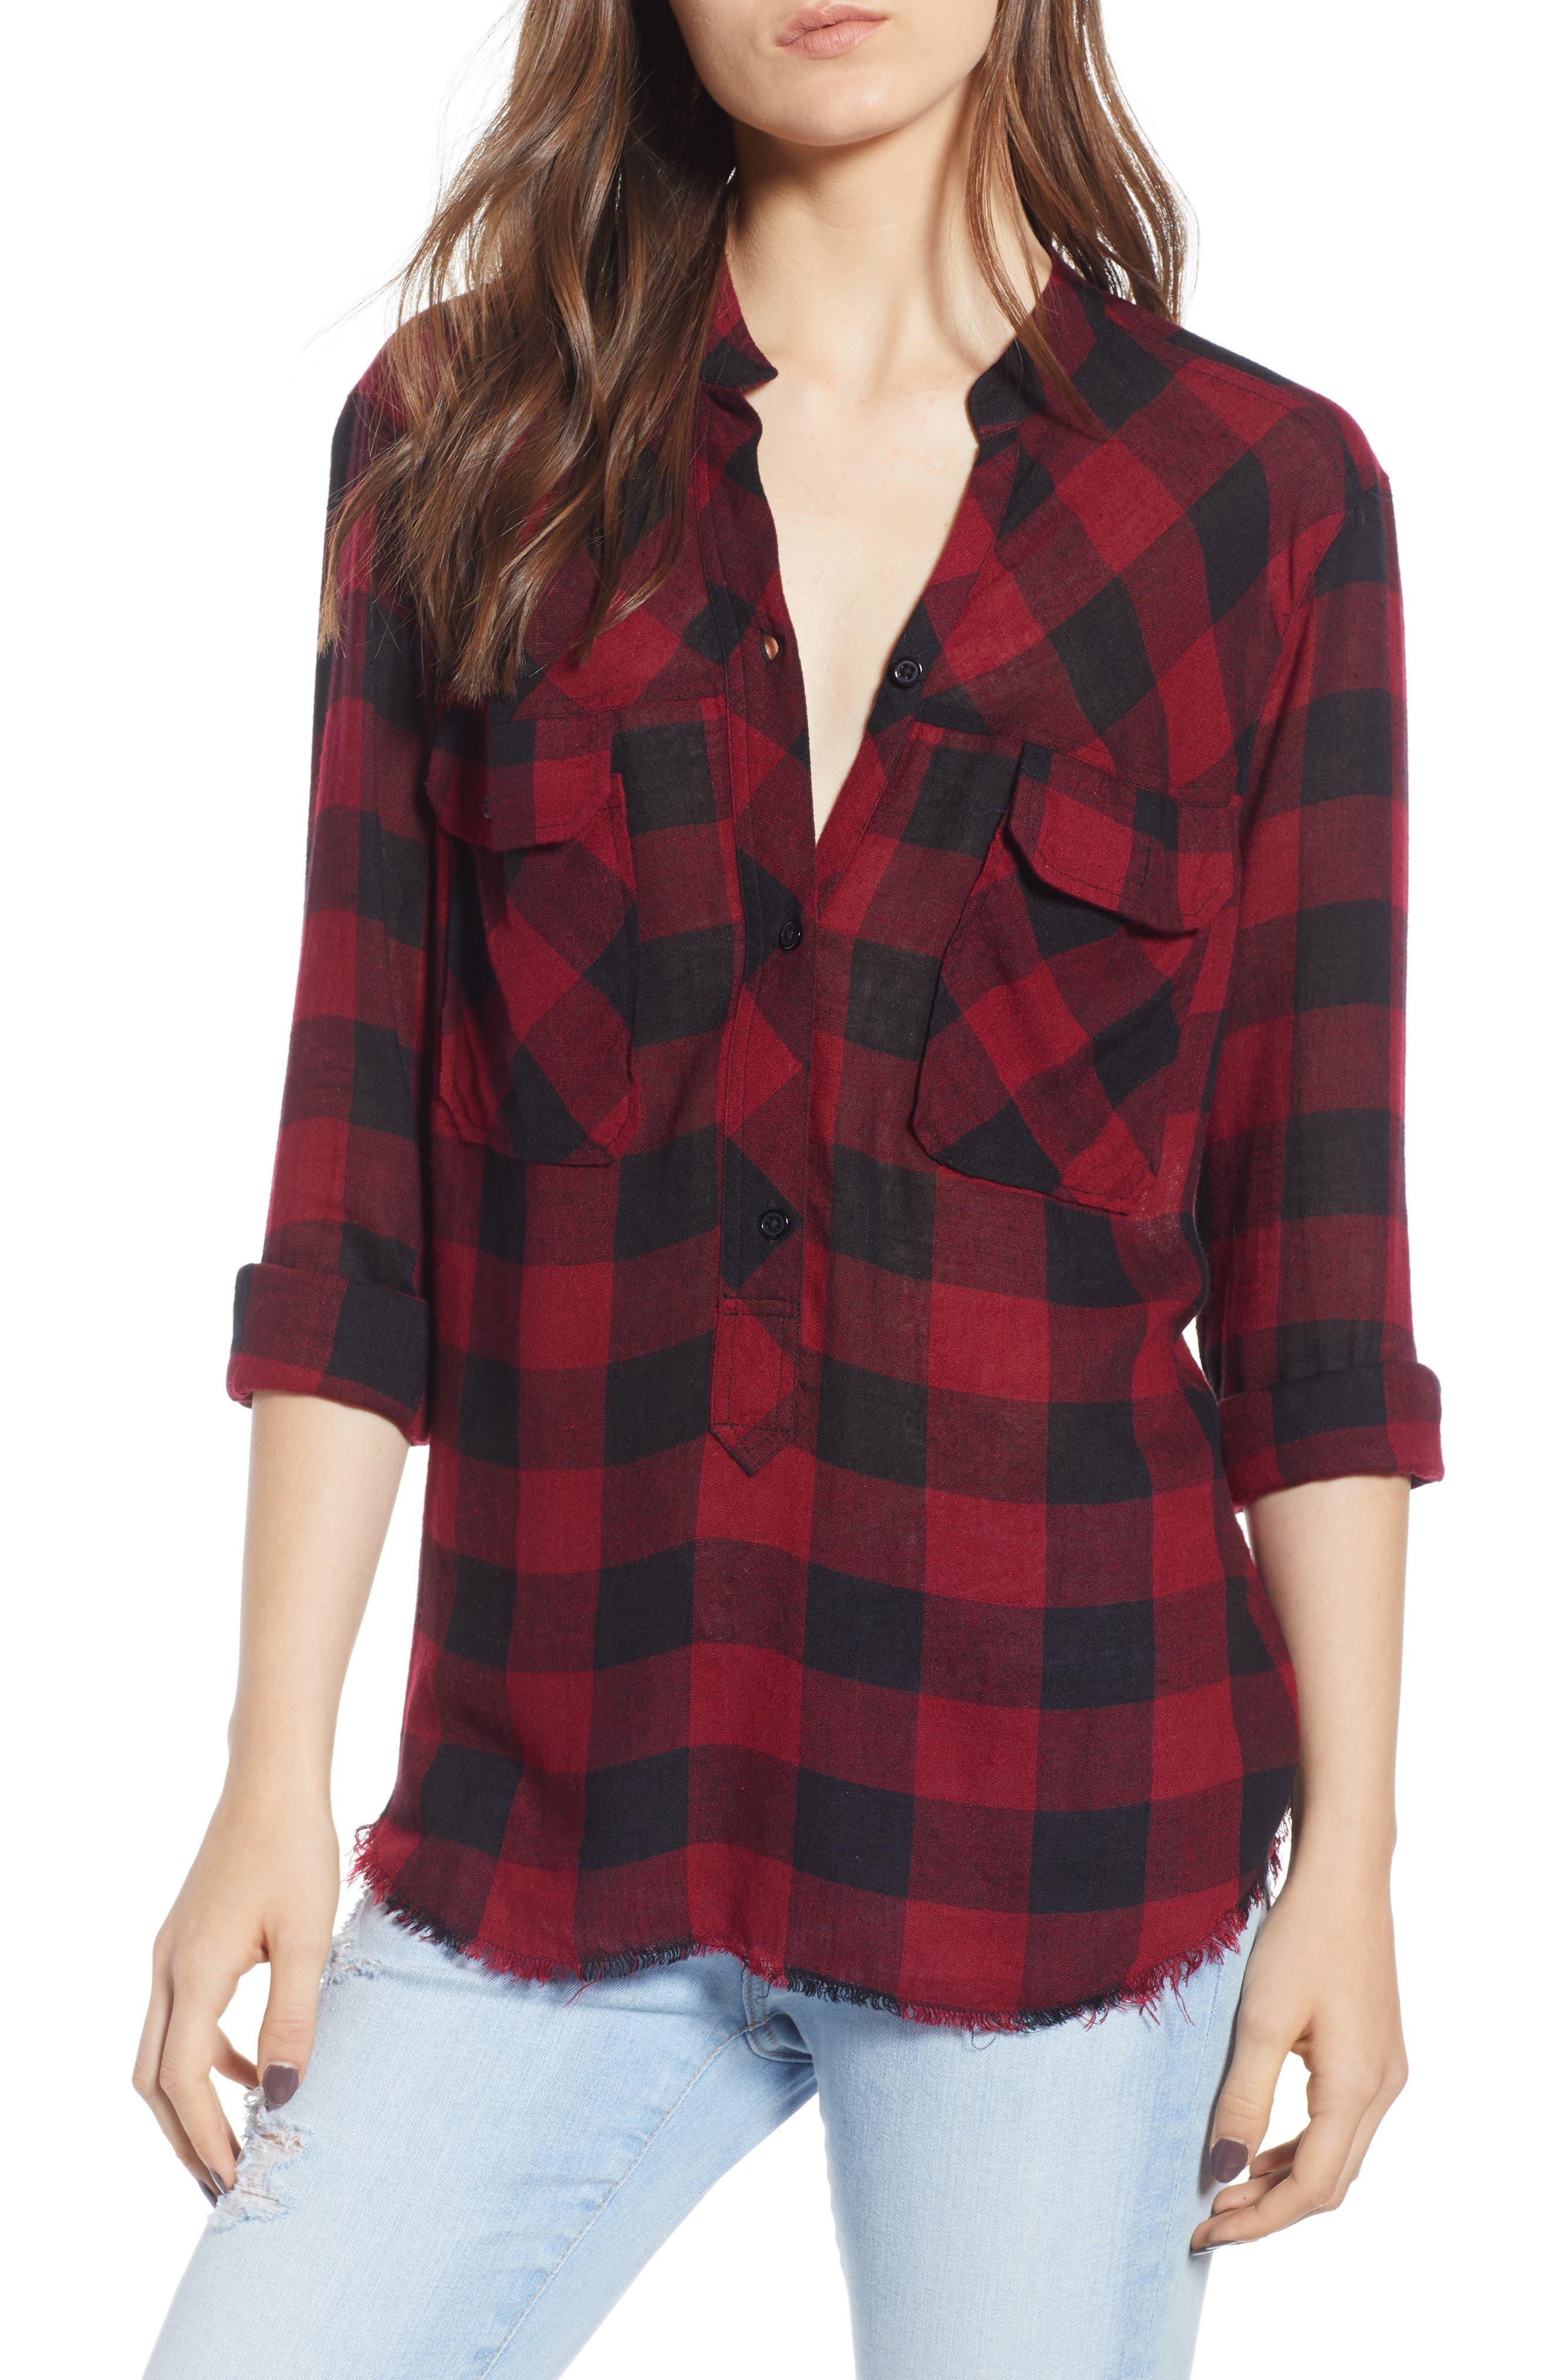 Redding Plaid Shirt,                             Main thumbnail 1, color,                             SANGUINE BLACK